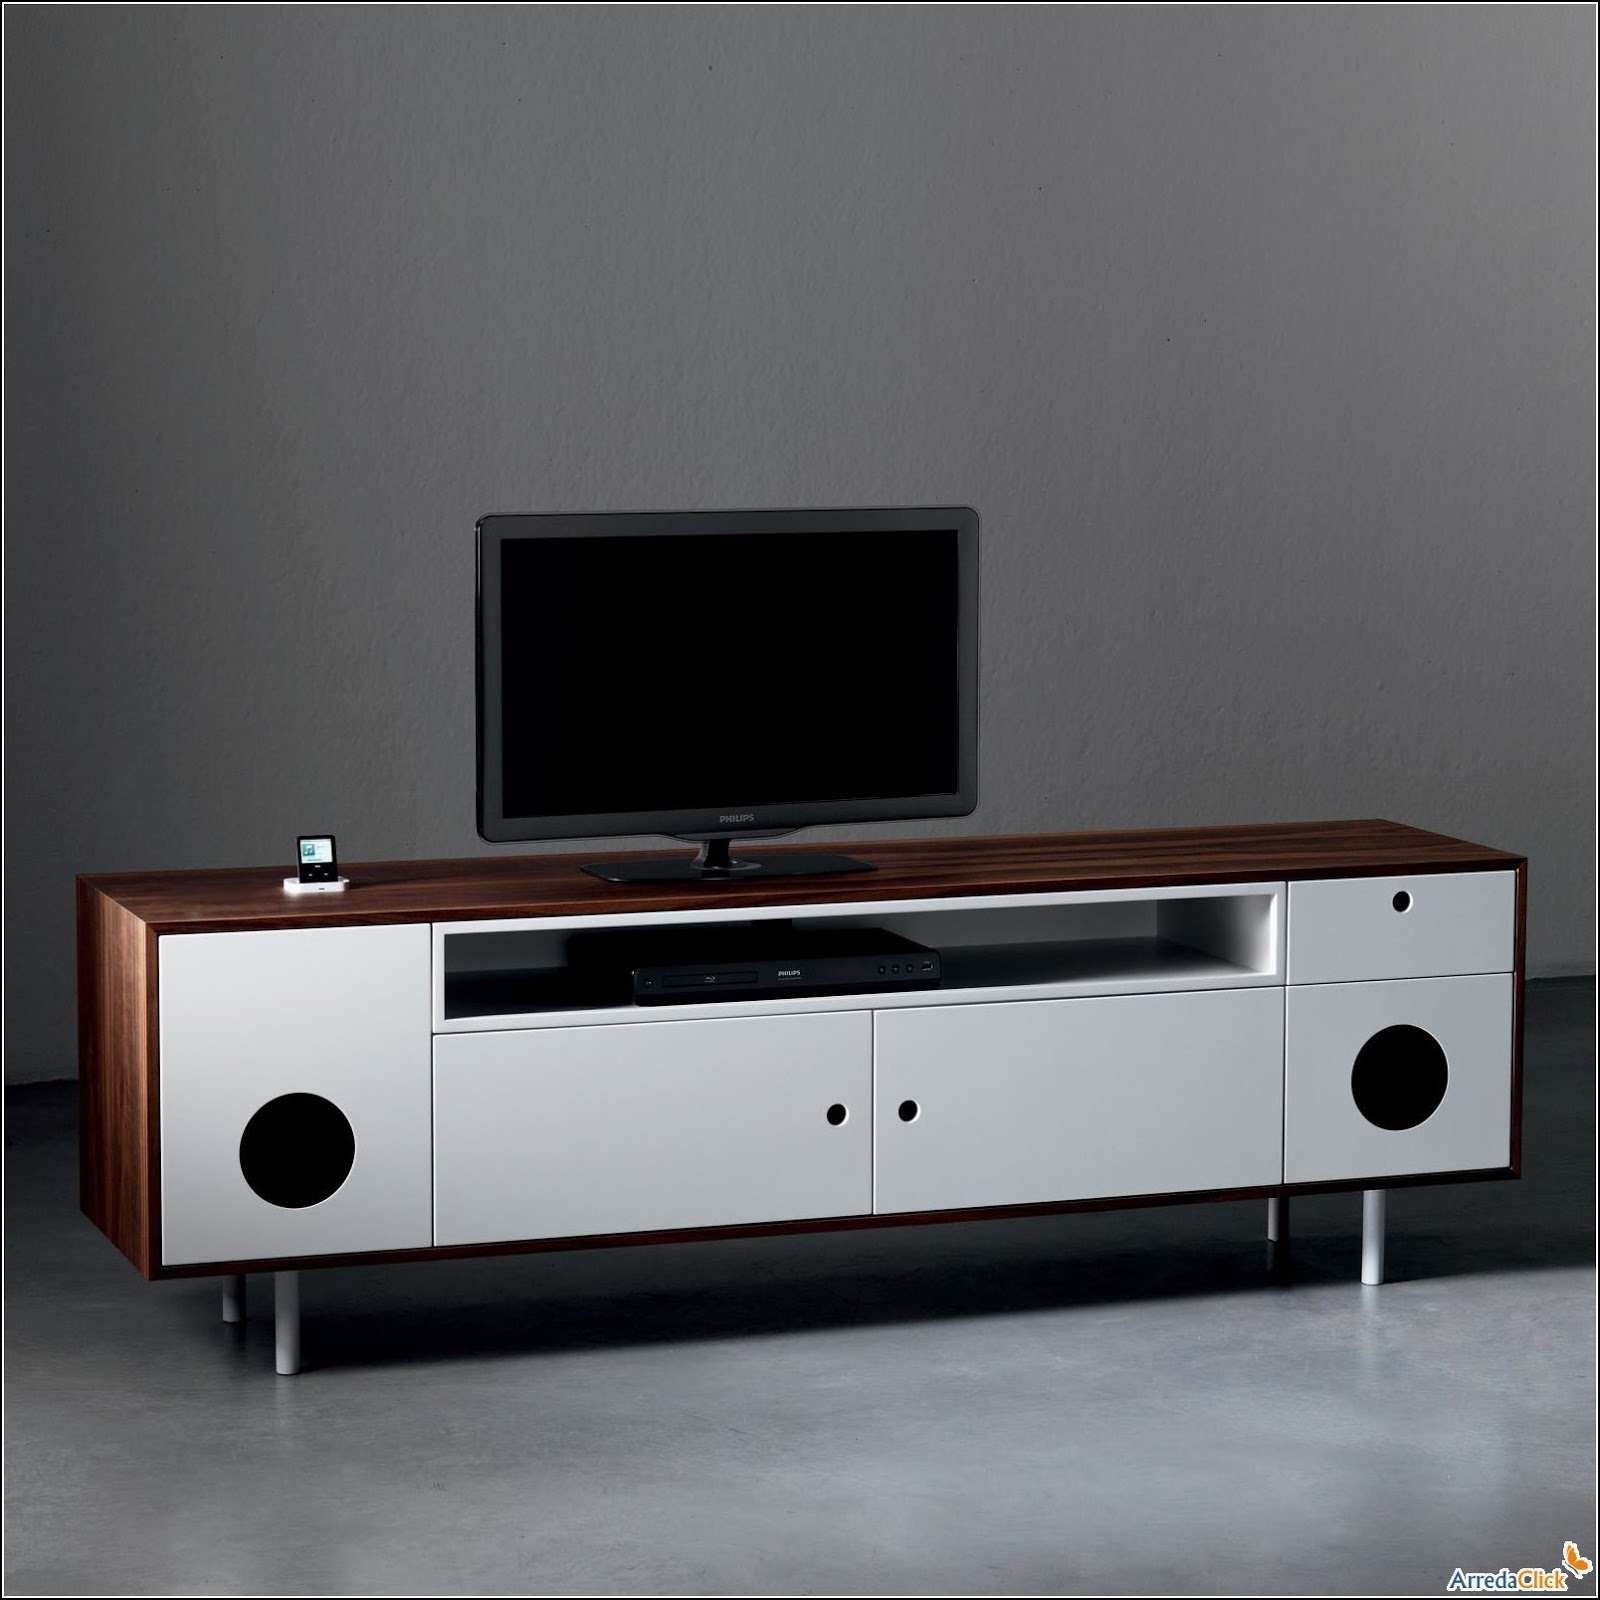 Arredaclick muebles italianos online muebles para televisor for Muebles italianos online